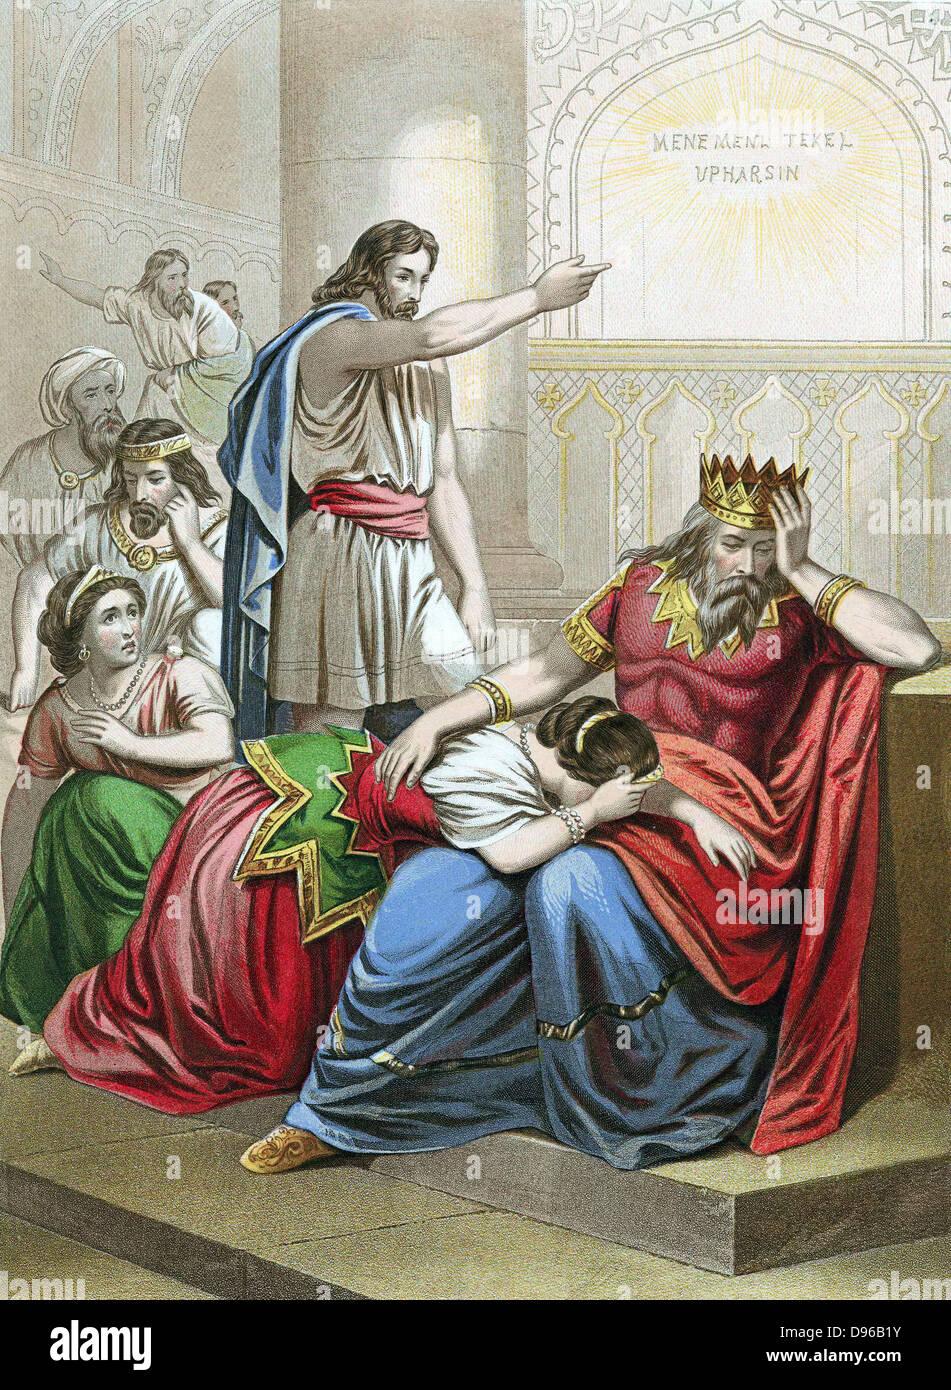 Image result for Belshazzar's Feast Daniel Interprets